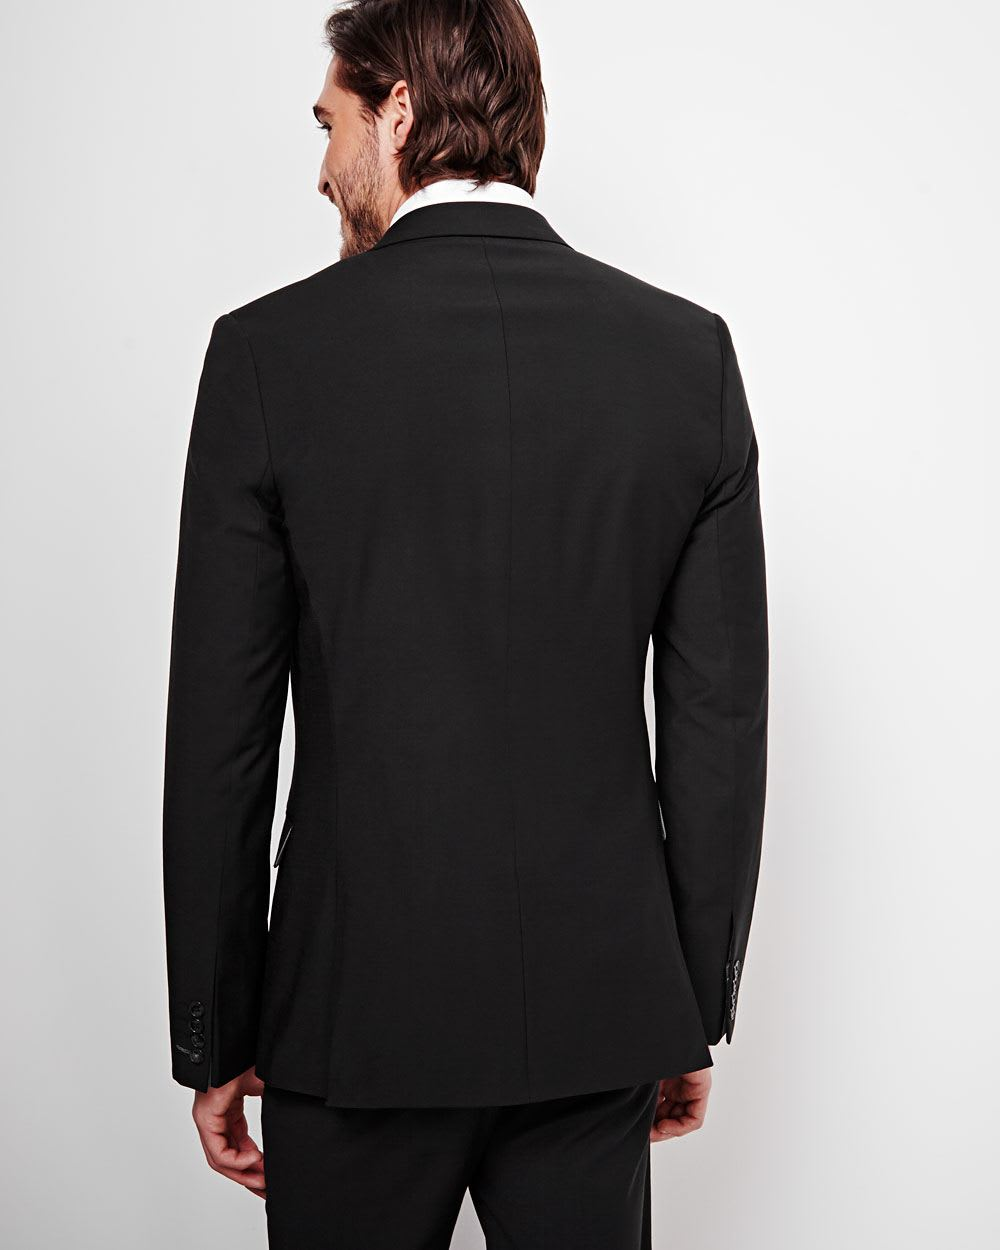 Essential Slim Fit Blazer - Tall | RW&CO.